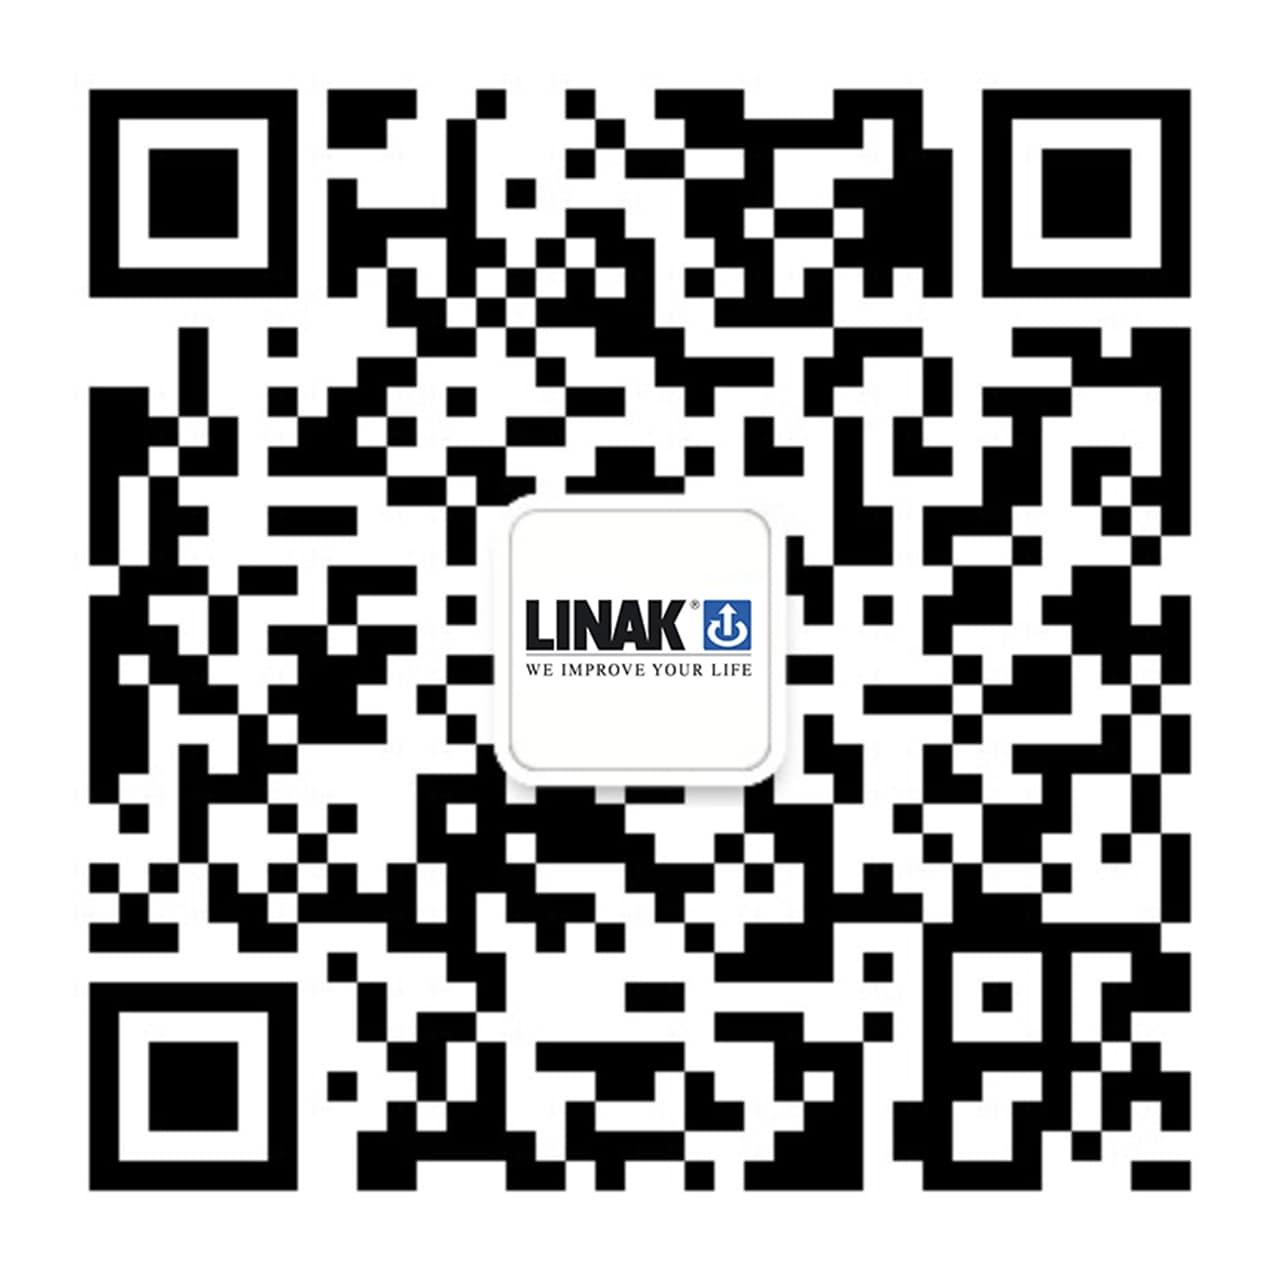 LINAK 中國微信